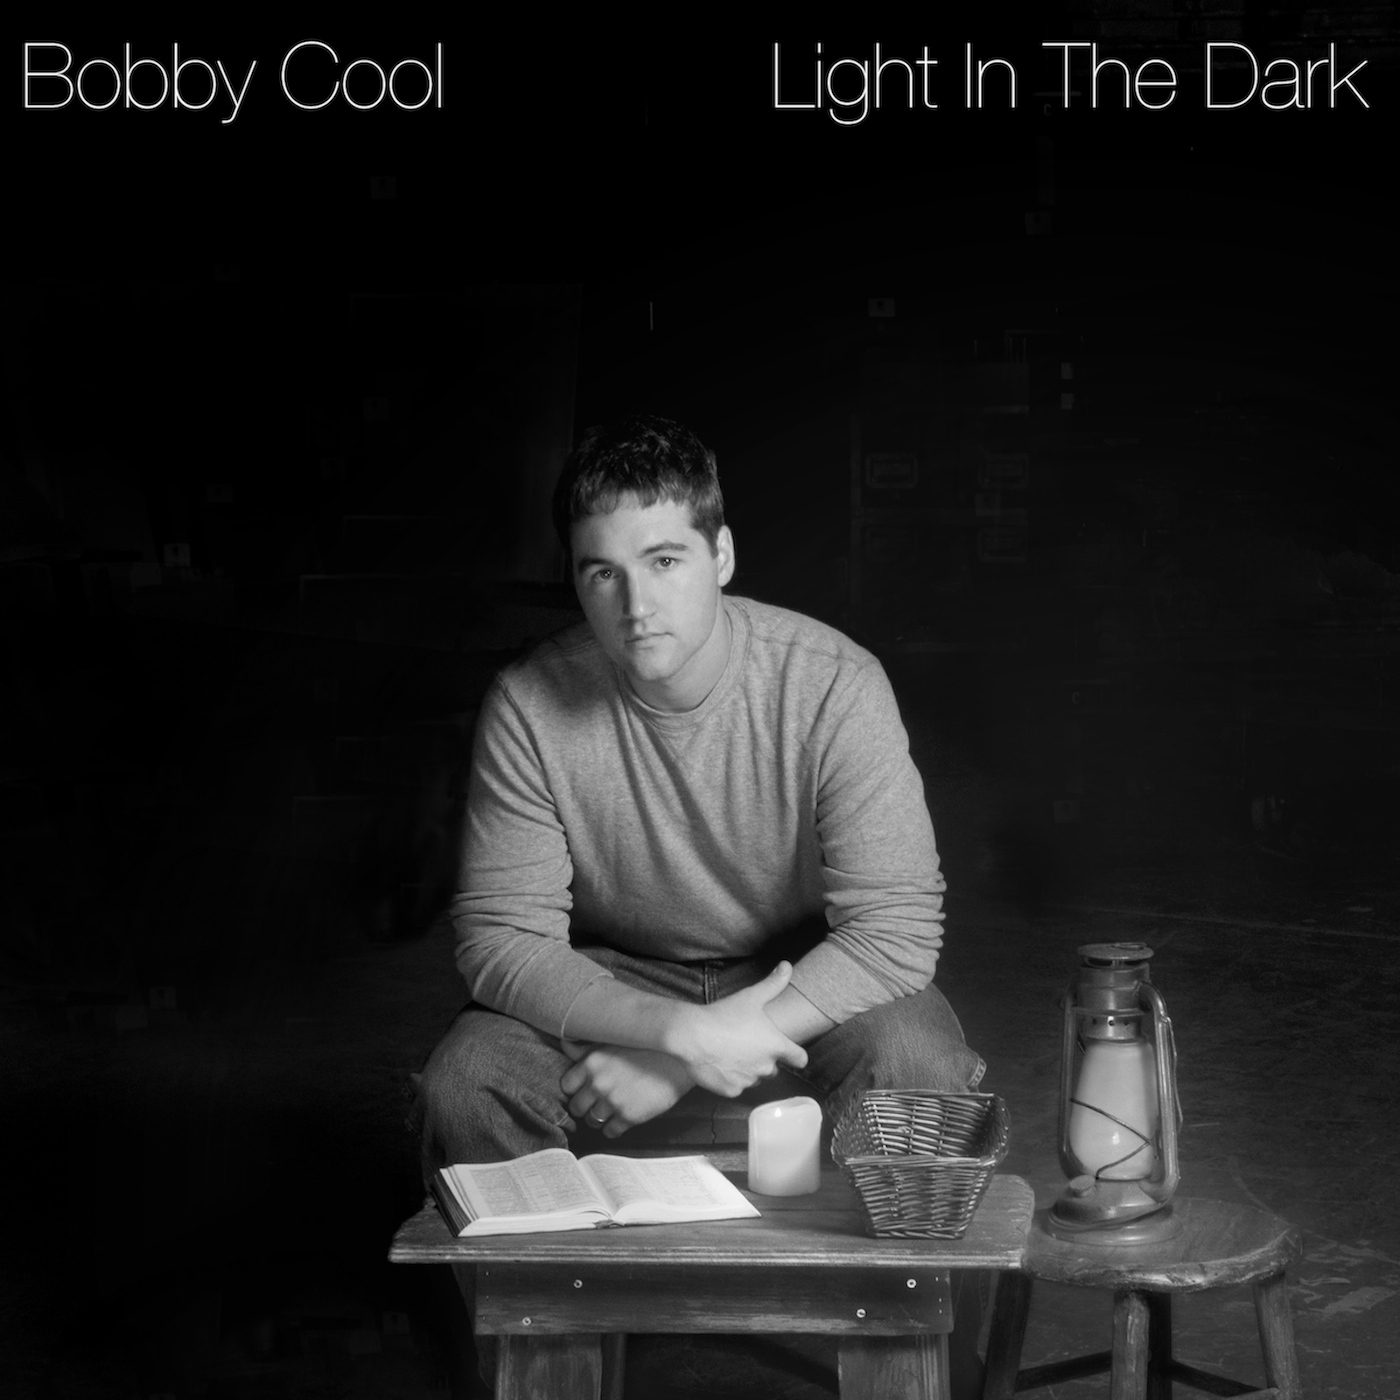 Bobby cool